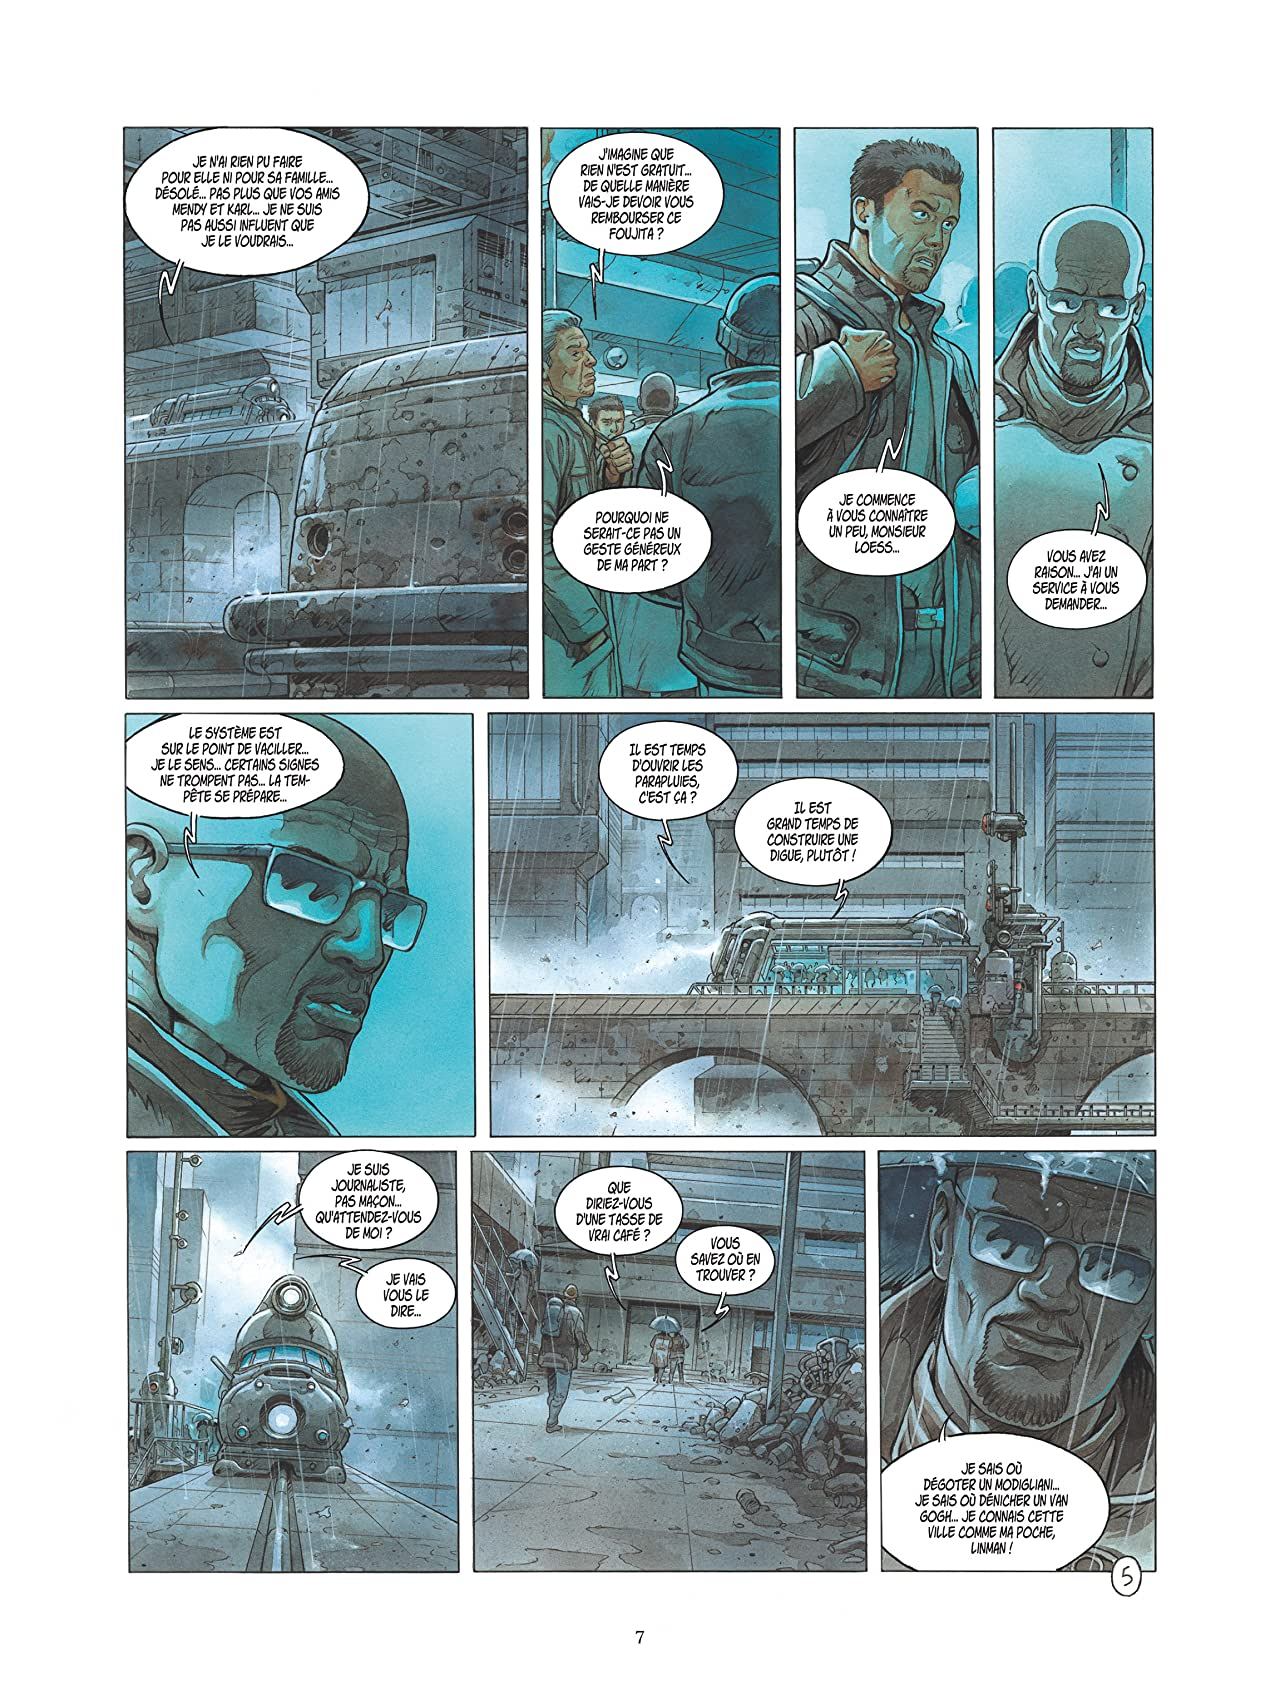 Metronom' Vol. 5: Habeas Mentem